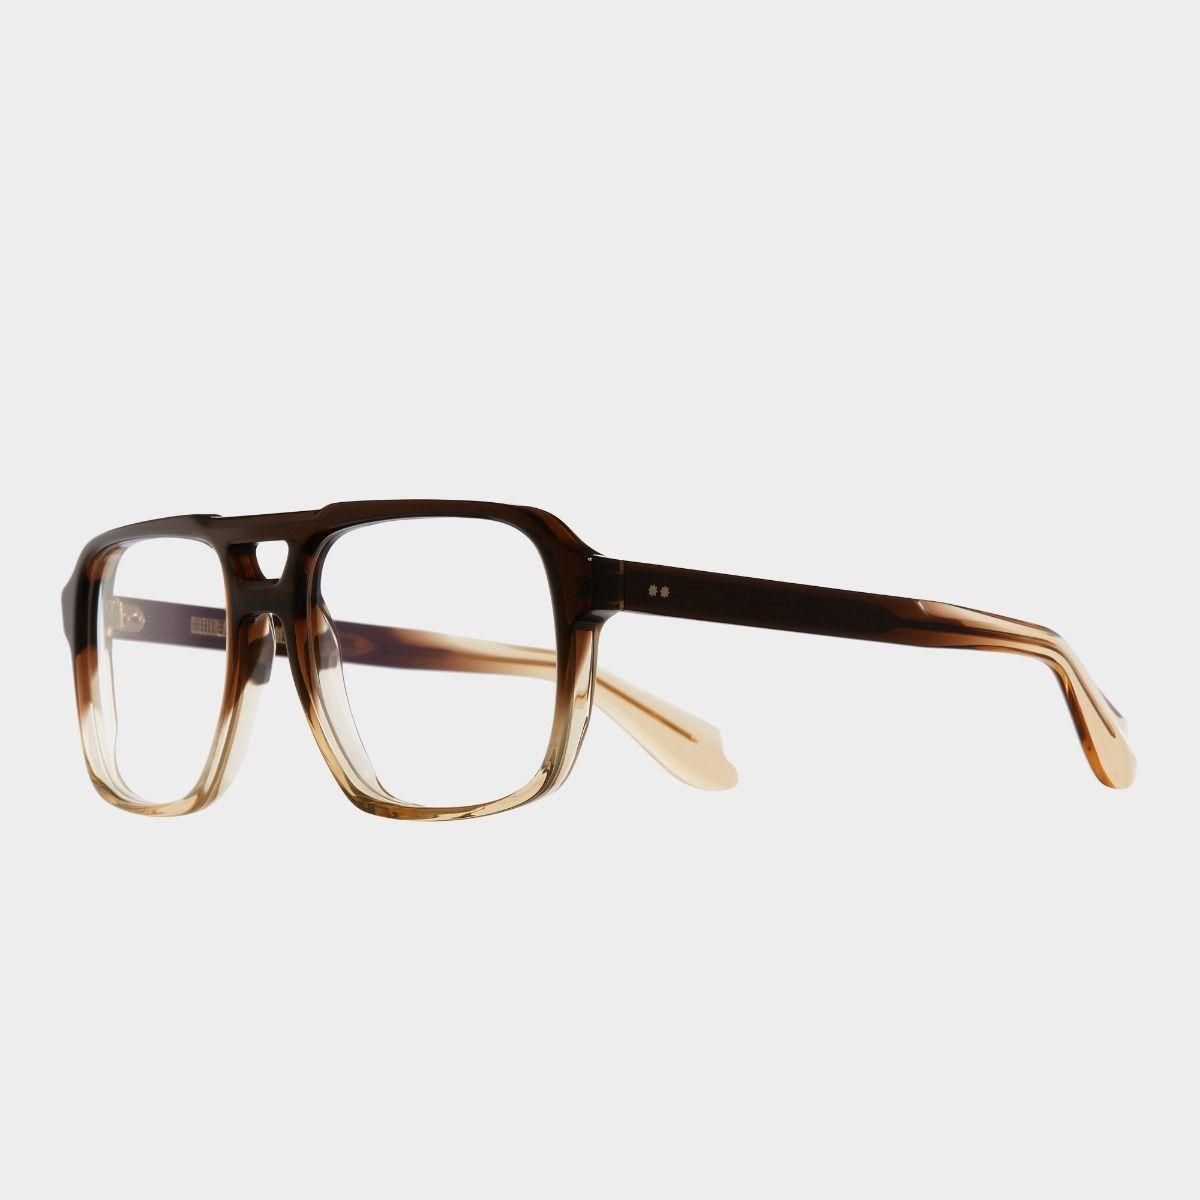 1394 Optical Aviator Glasses